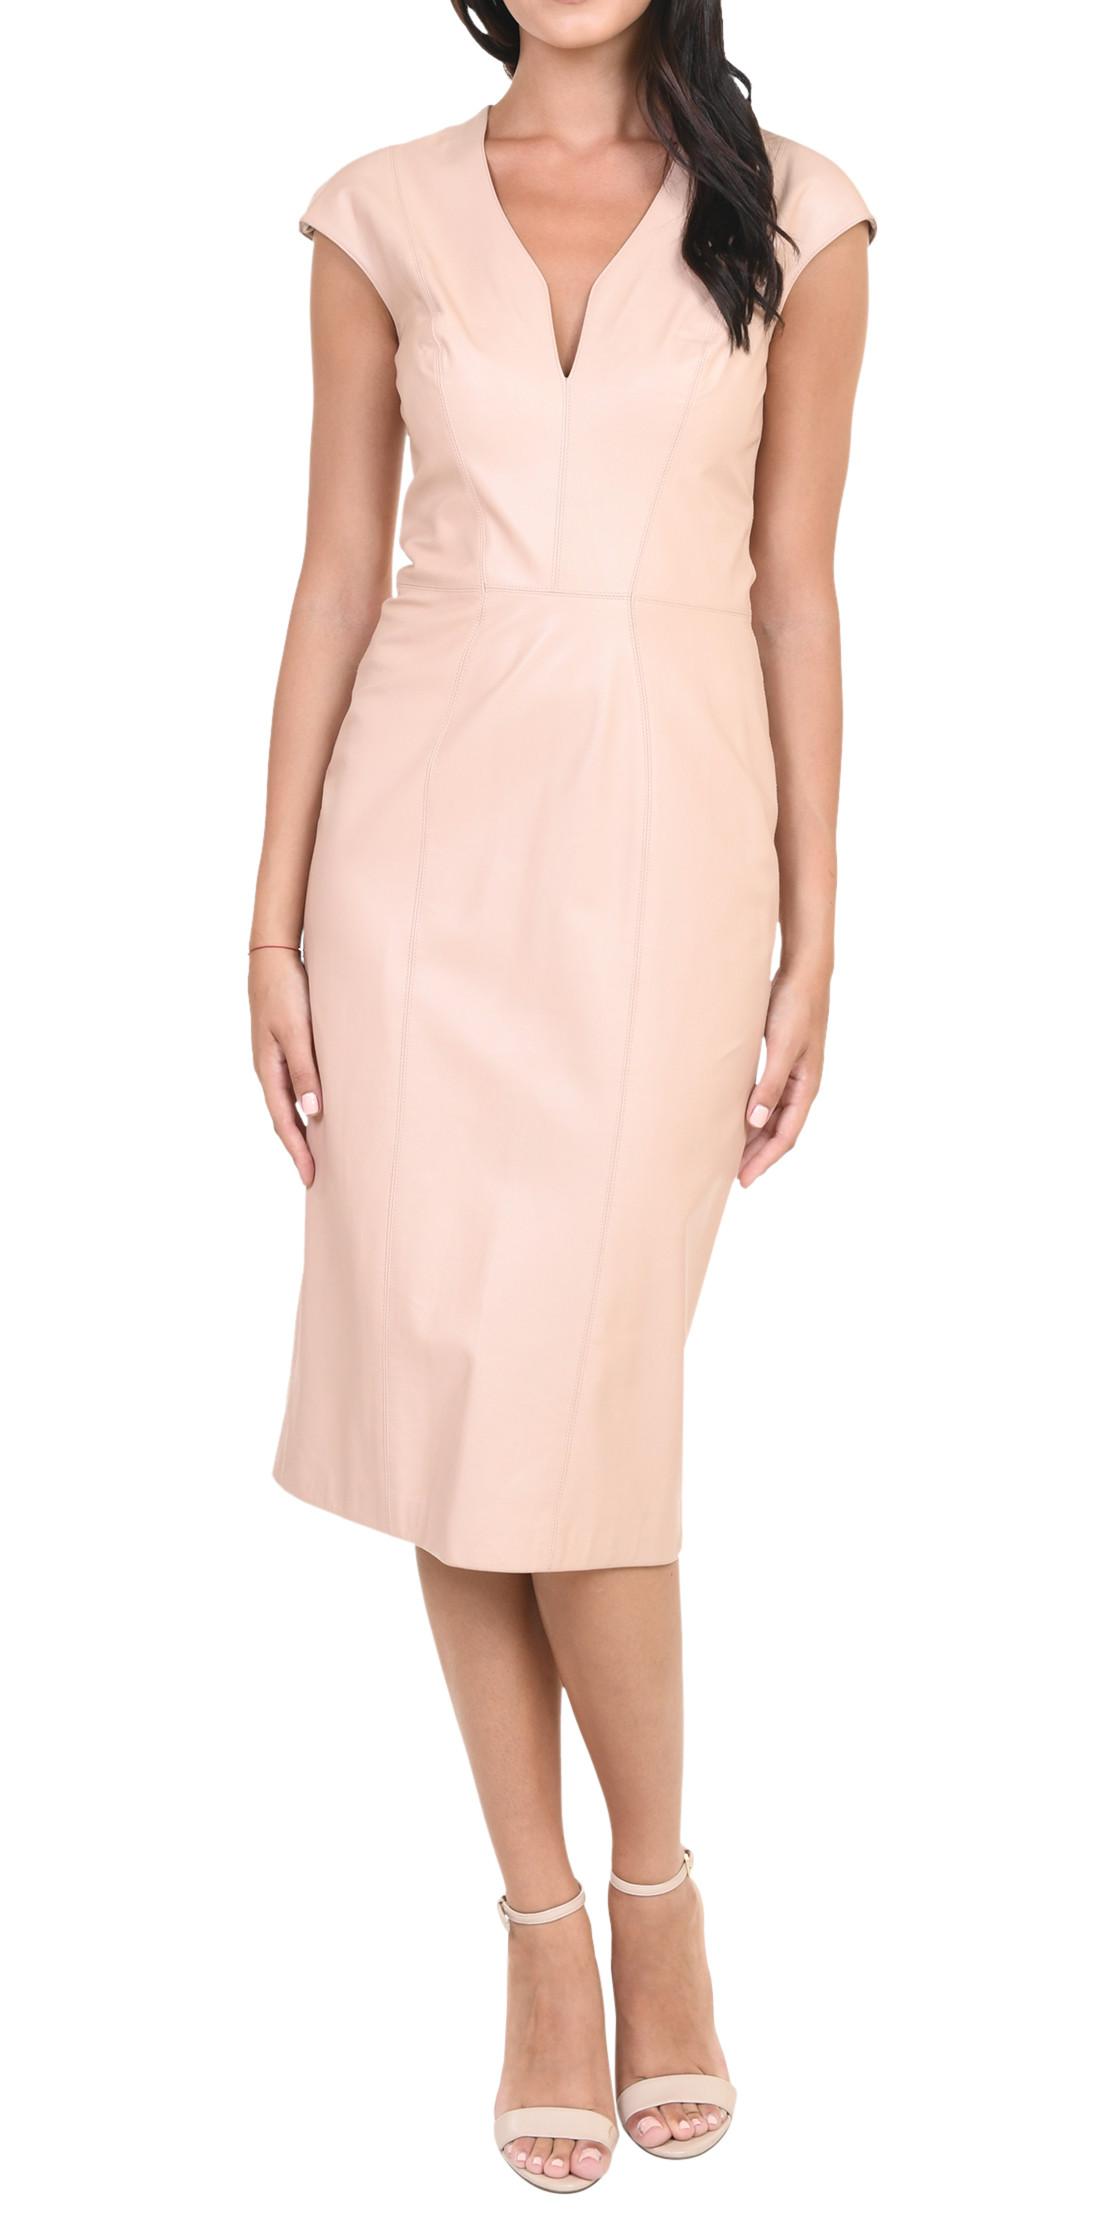 Reem Acra Leather V-Neck Dress   Cocktail Dress Rental   Lebanon ...